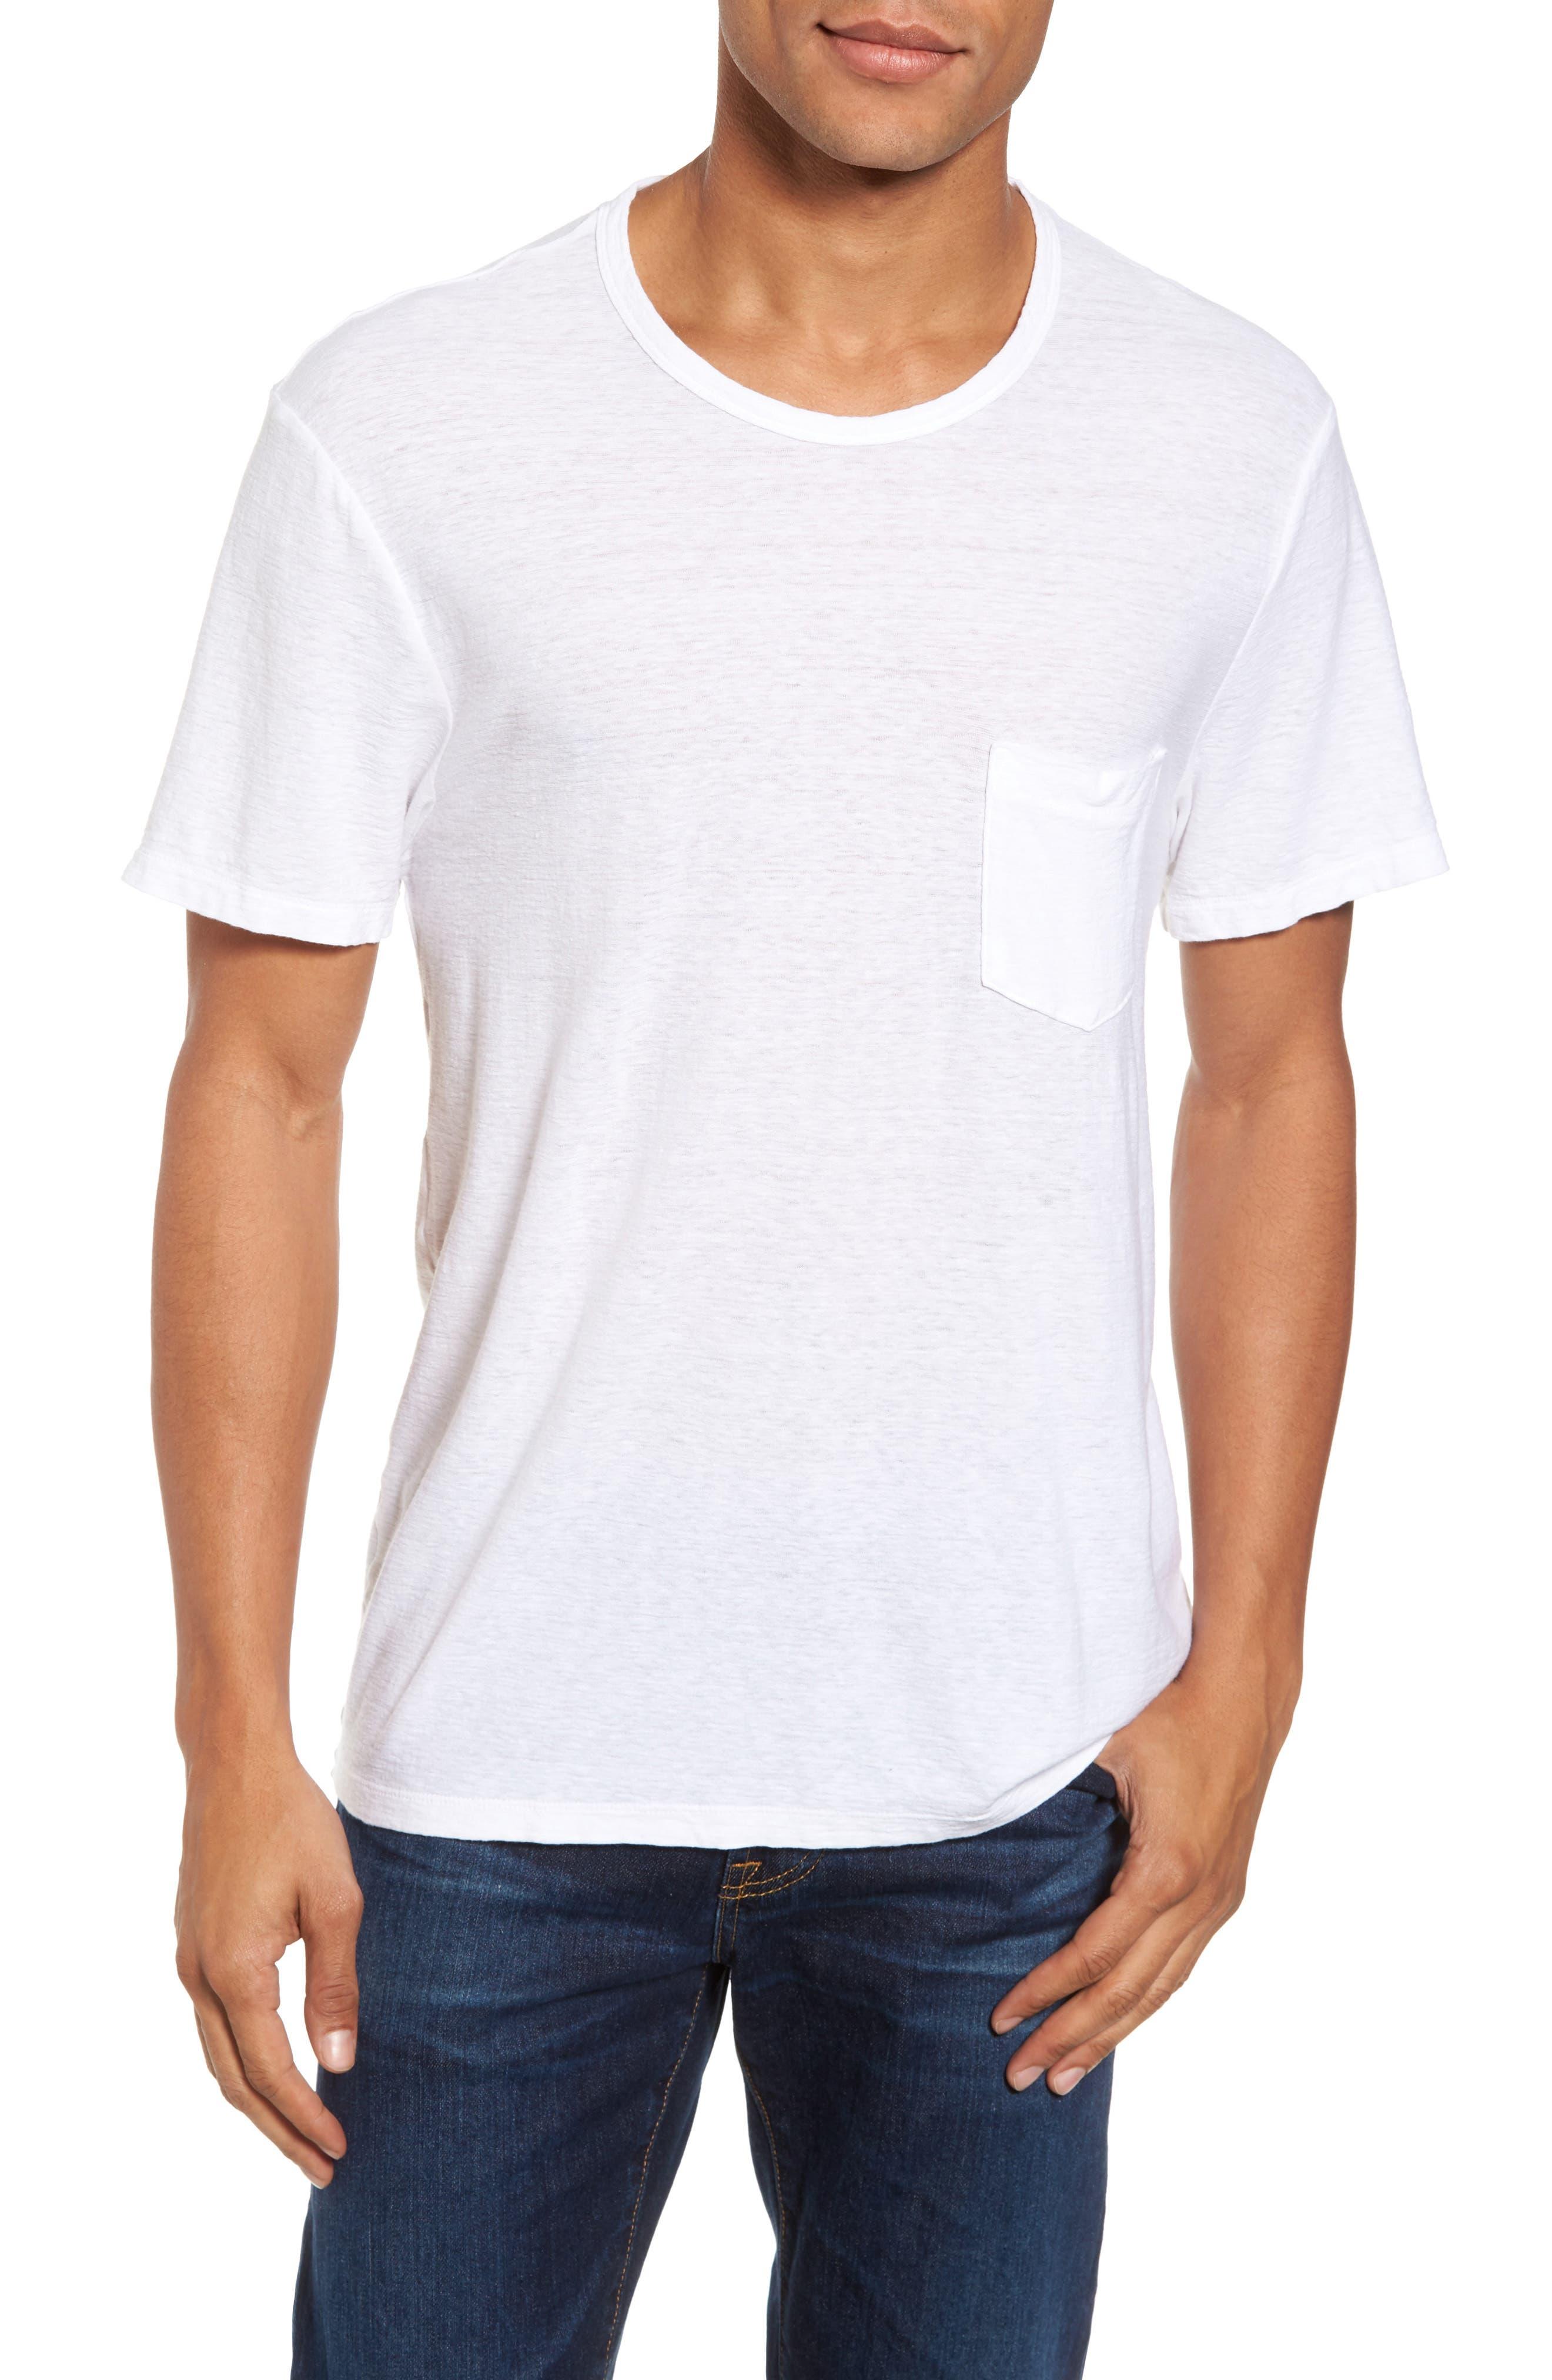 Main Image - James Perse Cotton & Linen Pocket T-Shirt